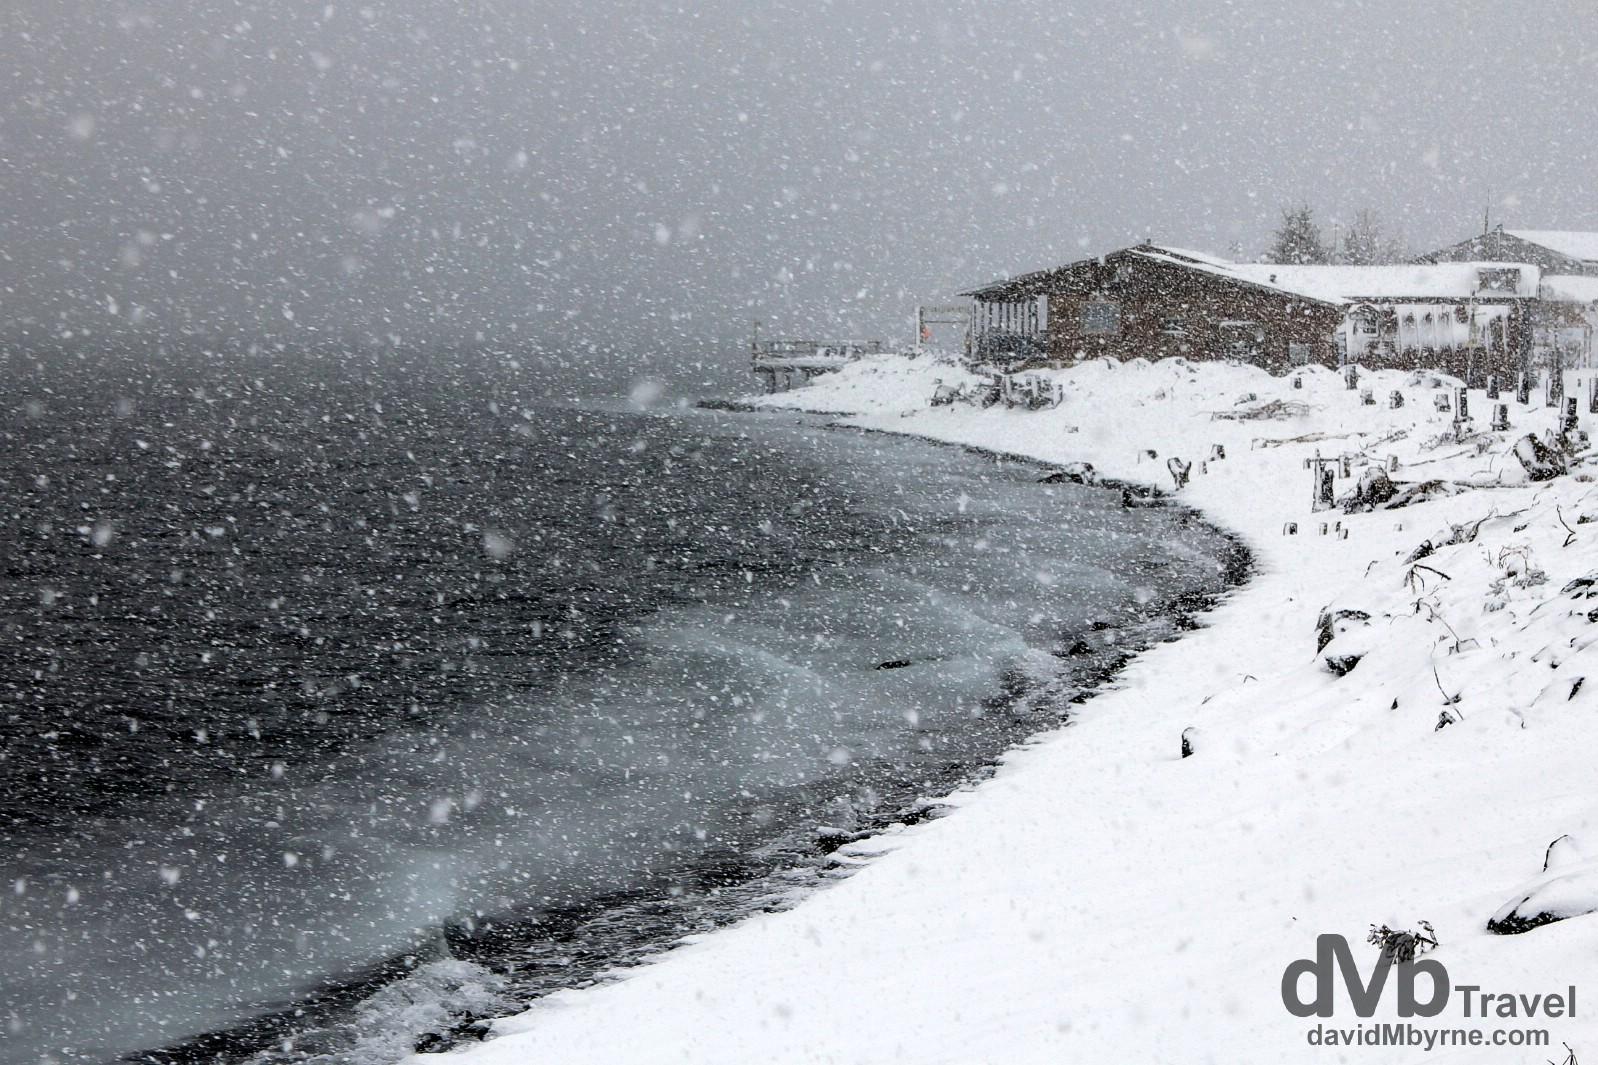 Snow on Resurrection Bay, Lowell Point, Kenai Peninsula, Alaska, USA. March 14th 2013.